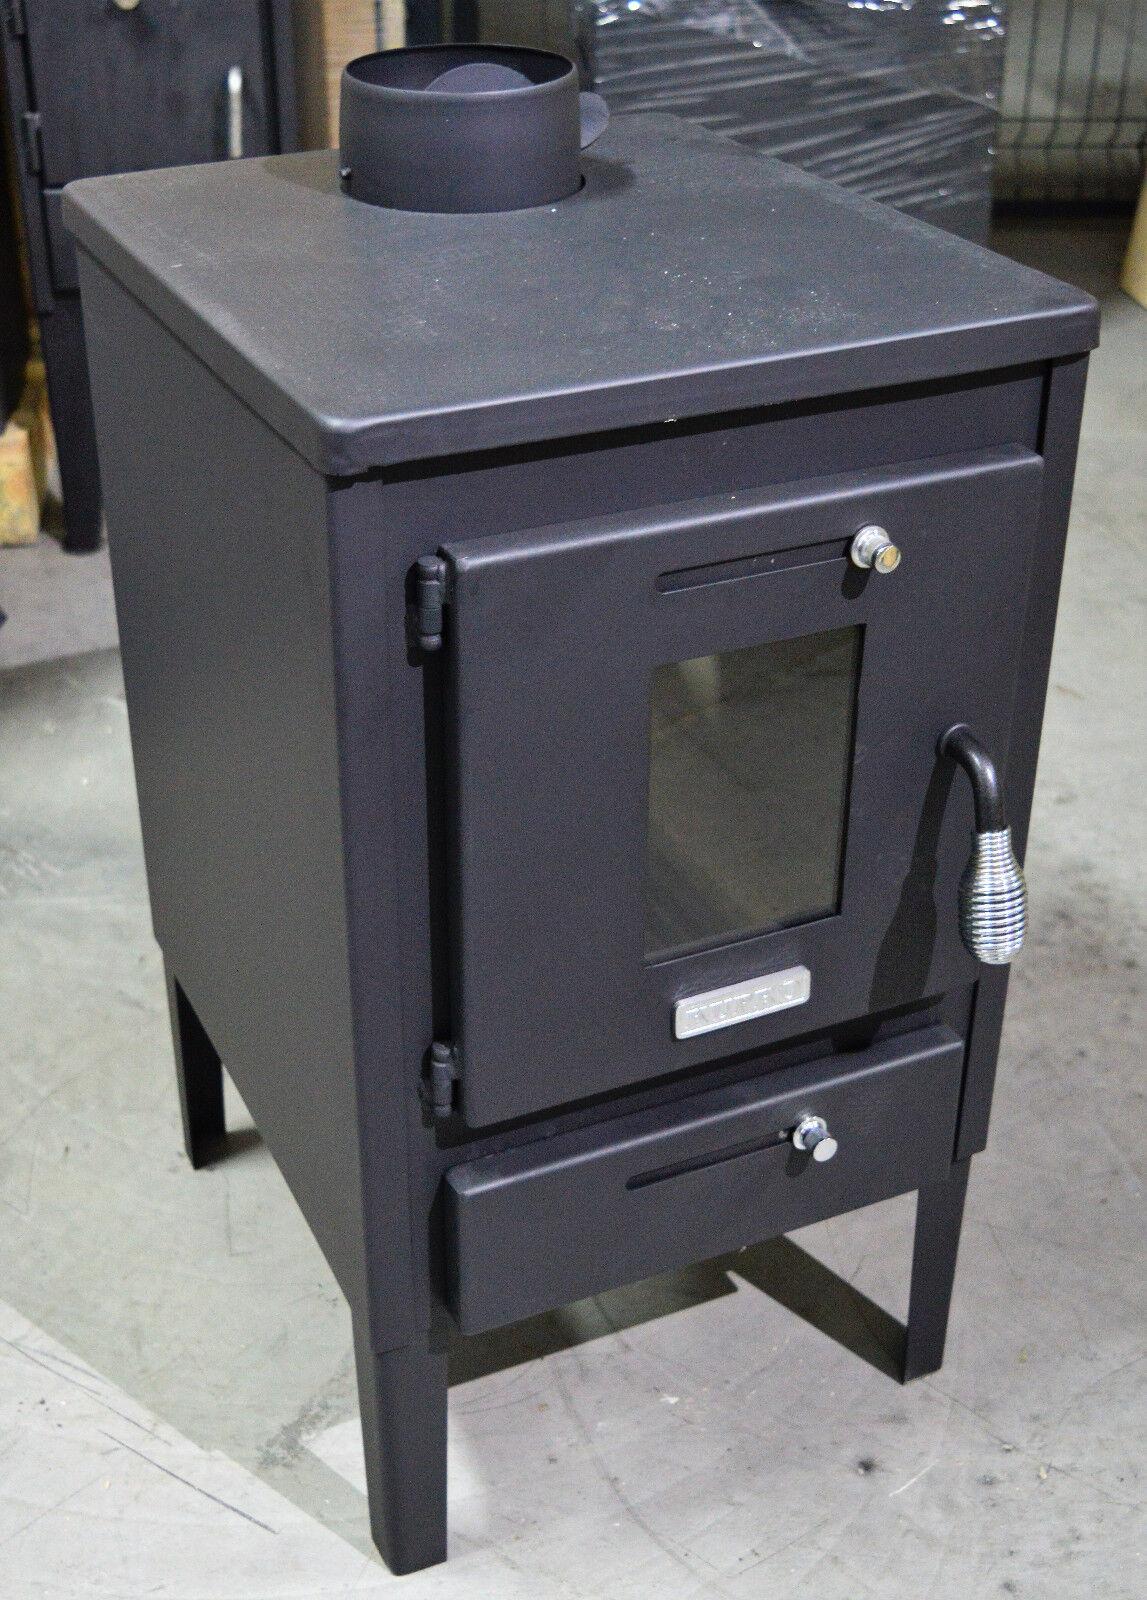 holz verbrennung herd holzofen kamin mini 8kw mit stahl deckel und klappe ebay. Black Bedroom Furniture Sets. Home Design Ideas